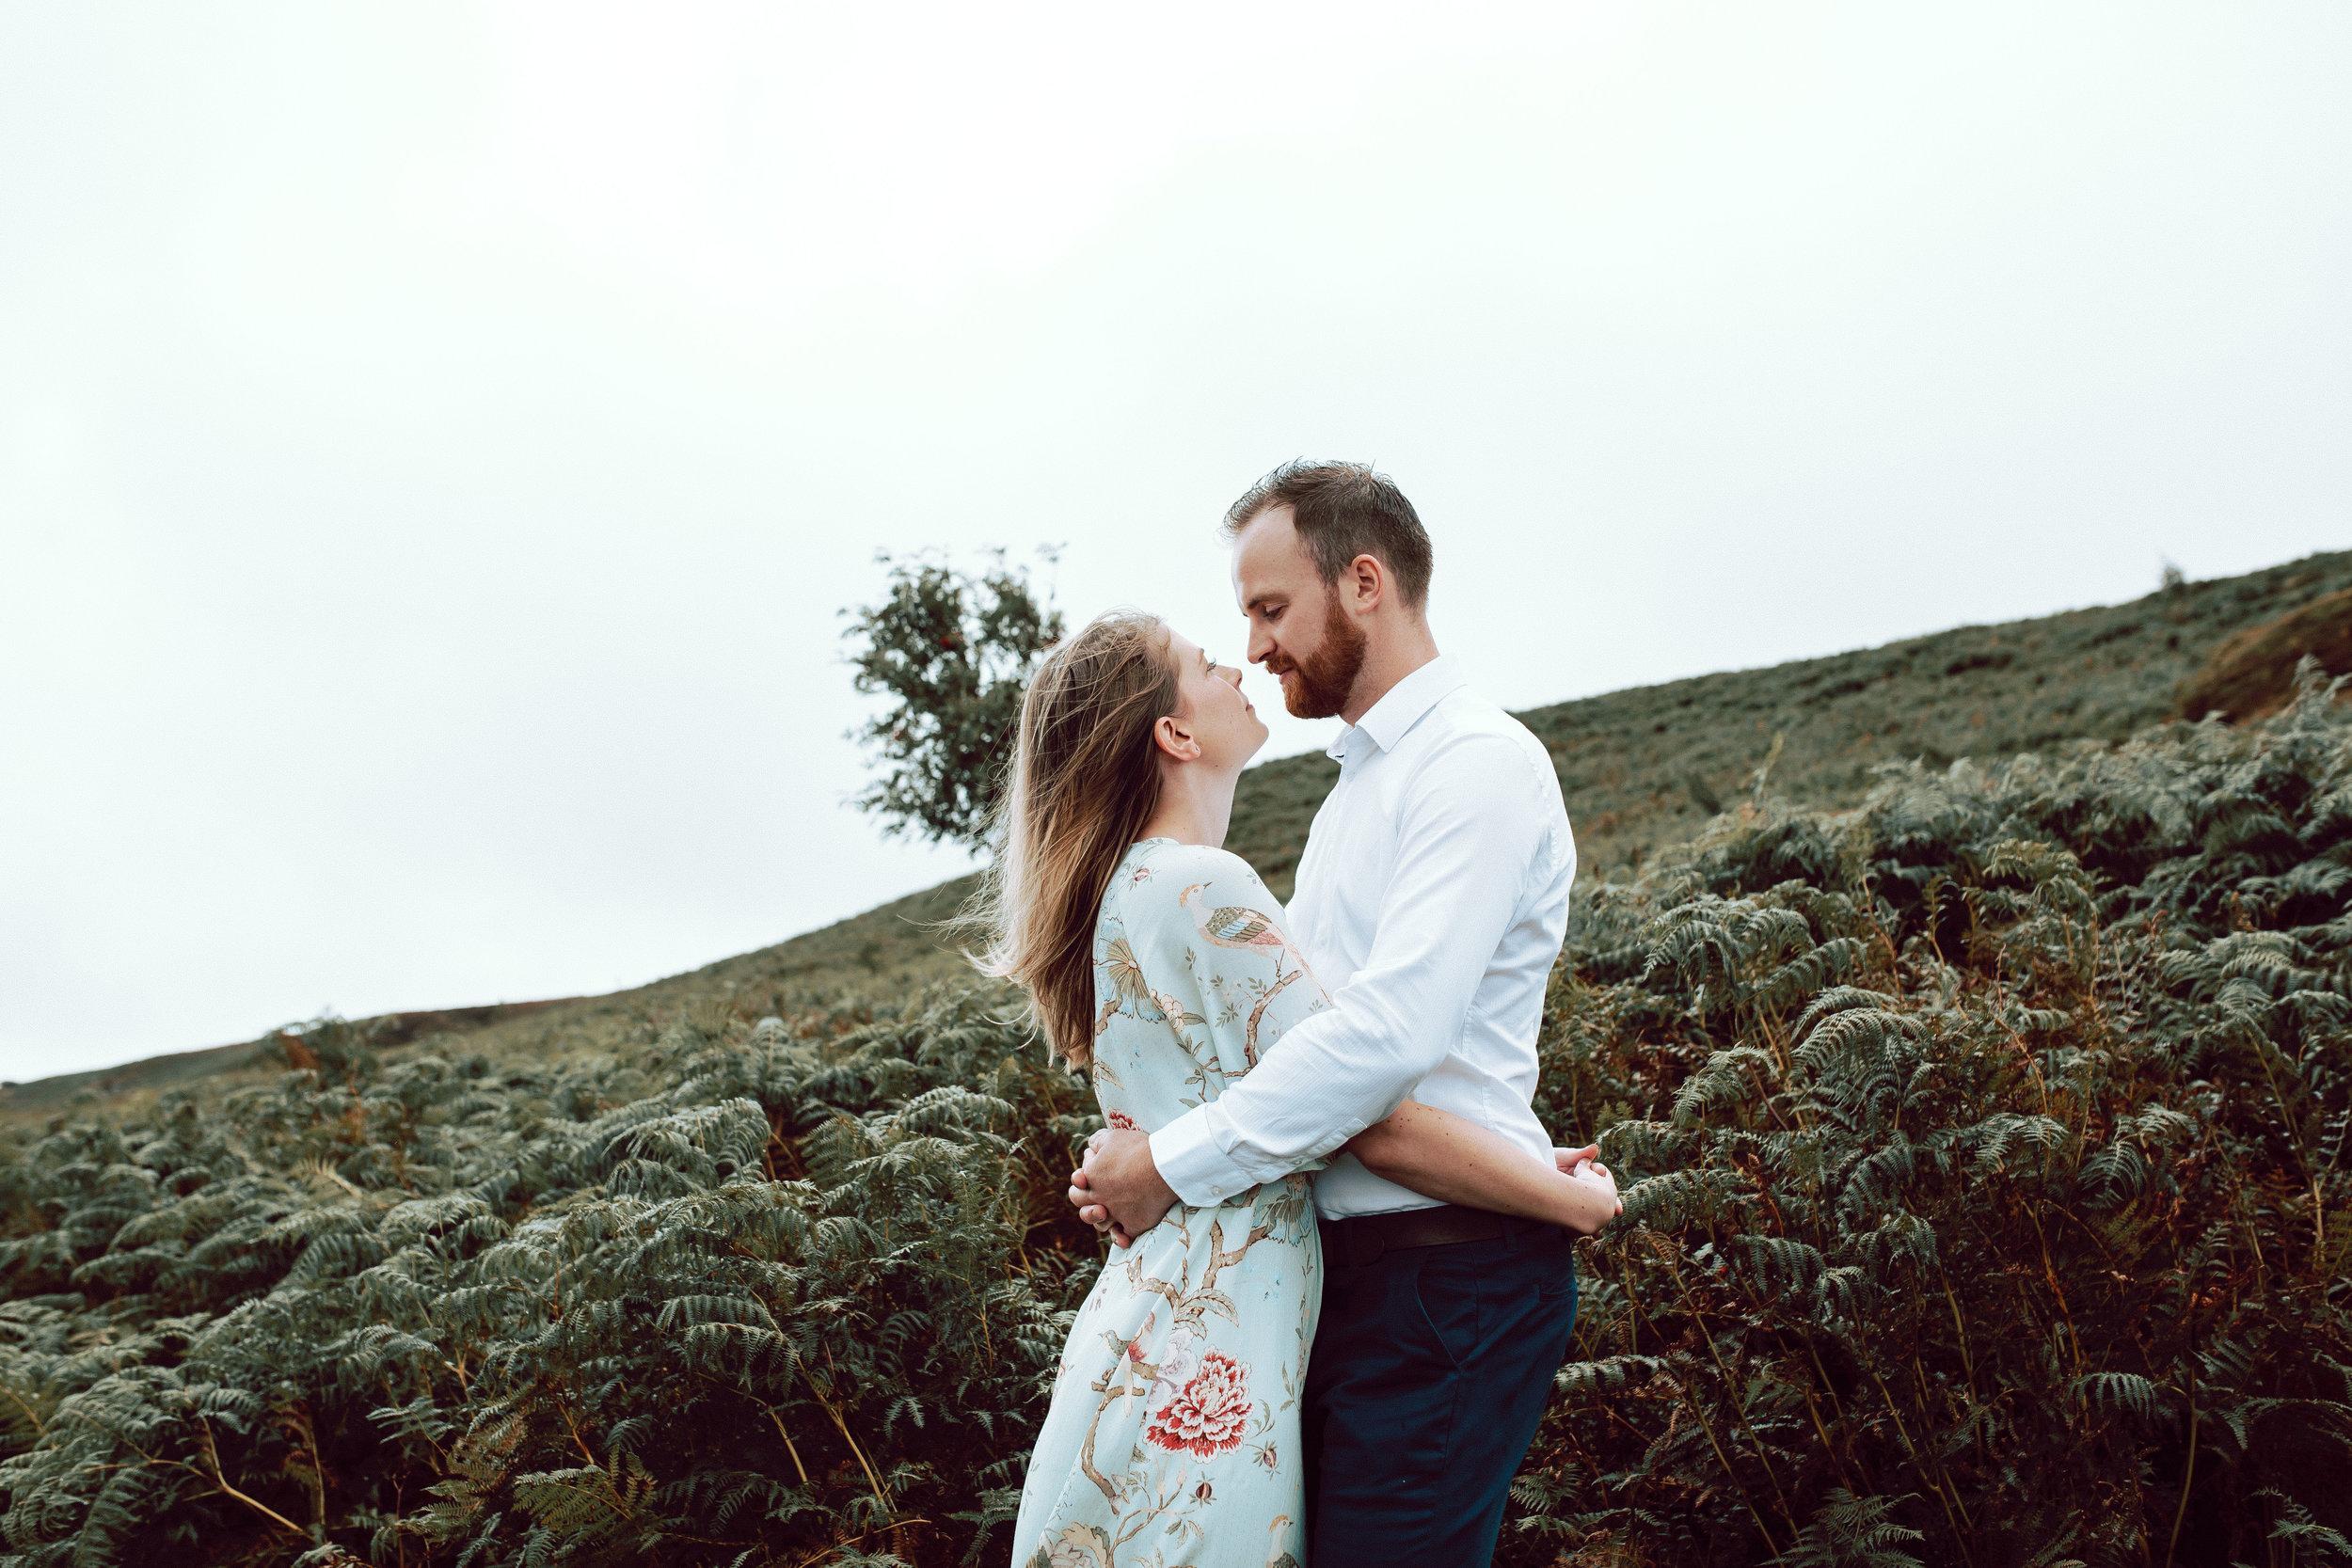 Abigail & Matthew Engagement session Ilkley